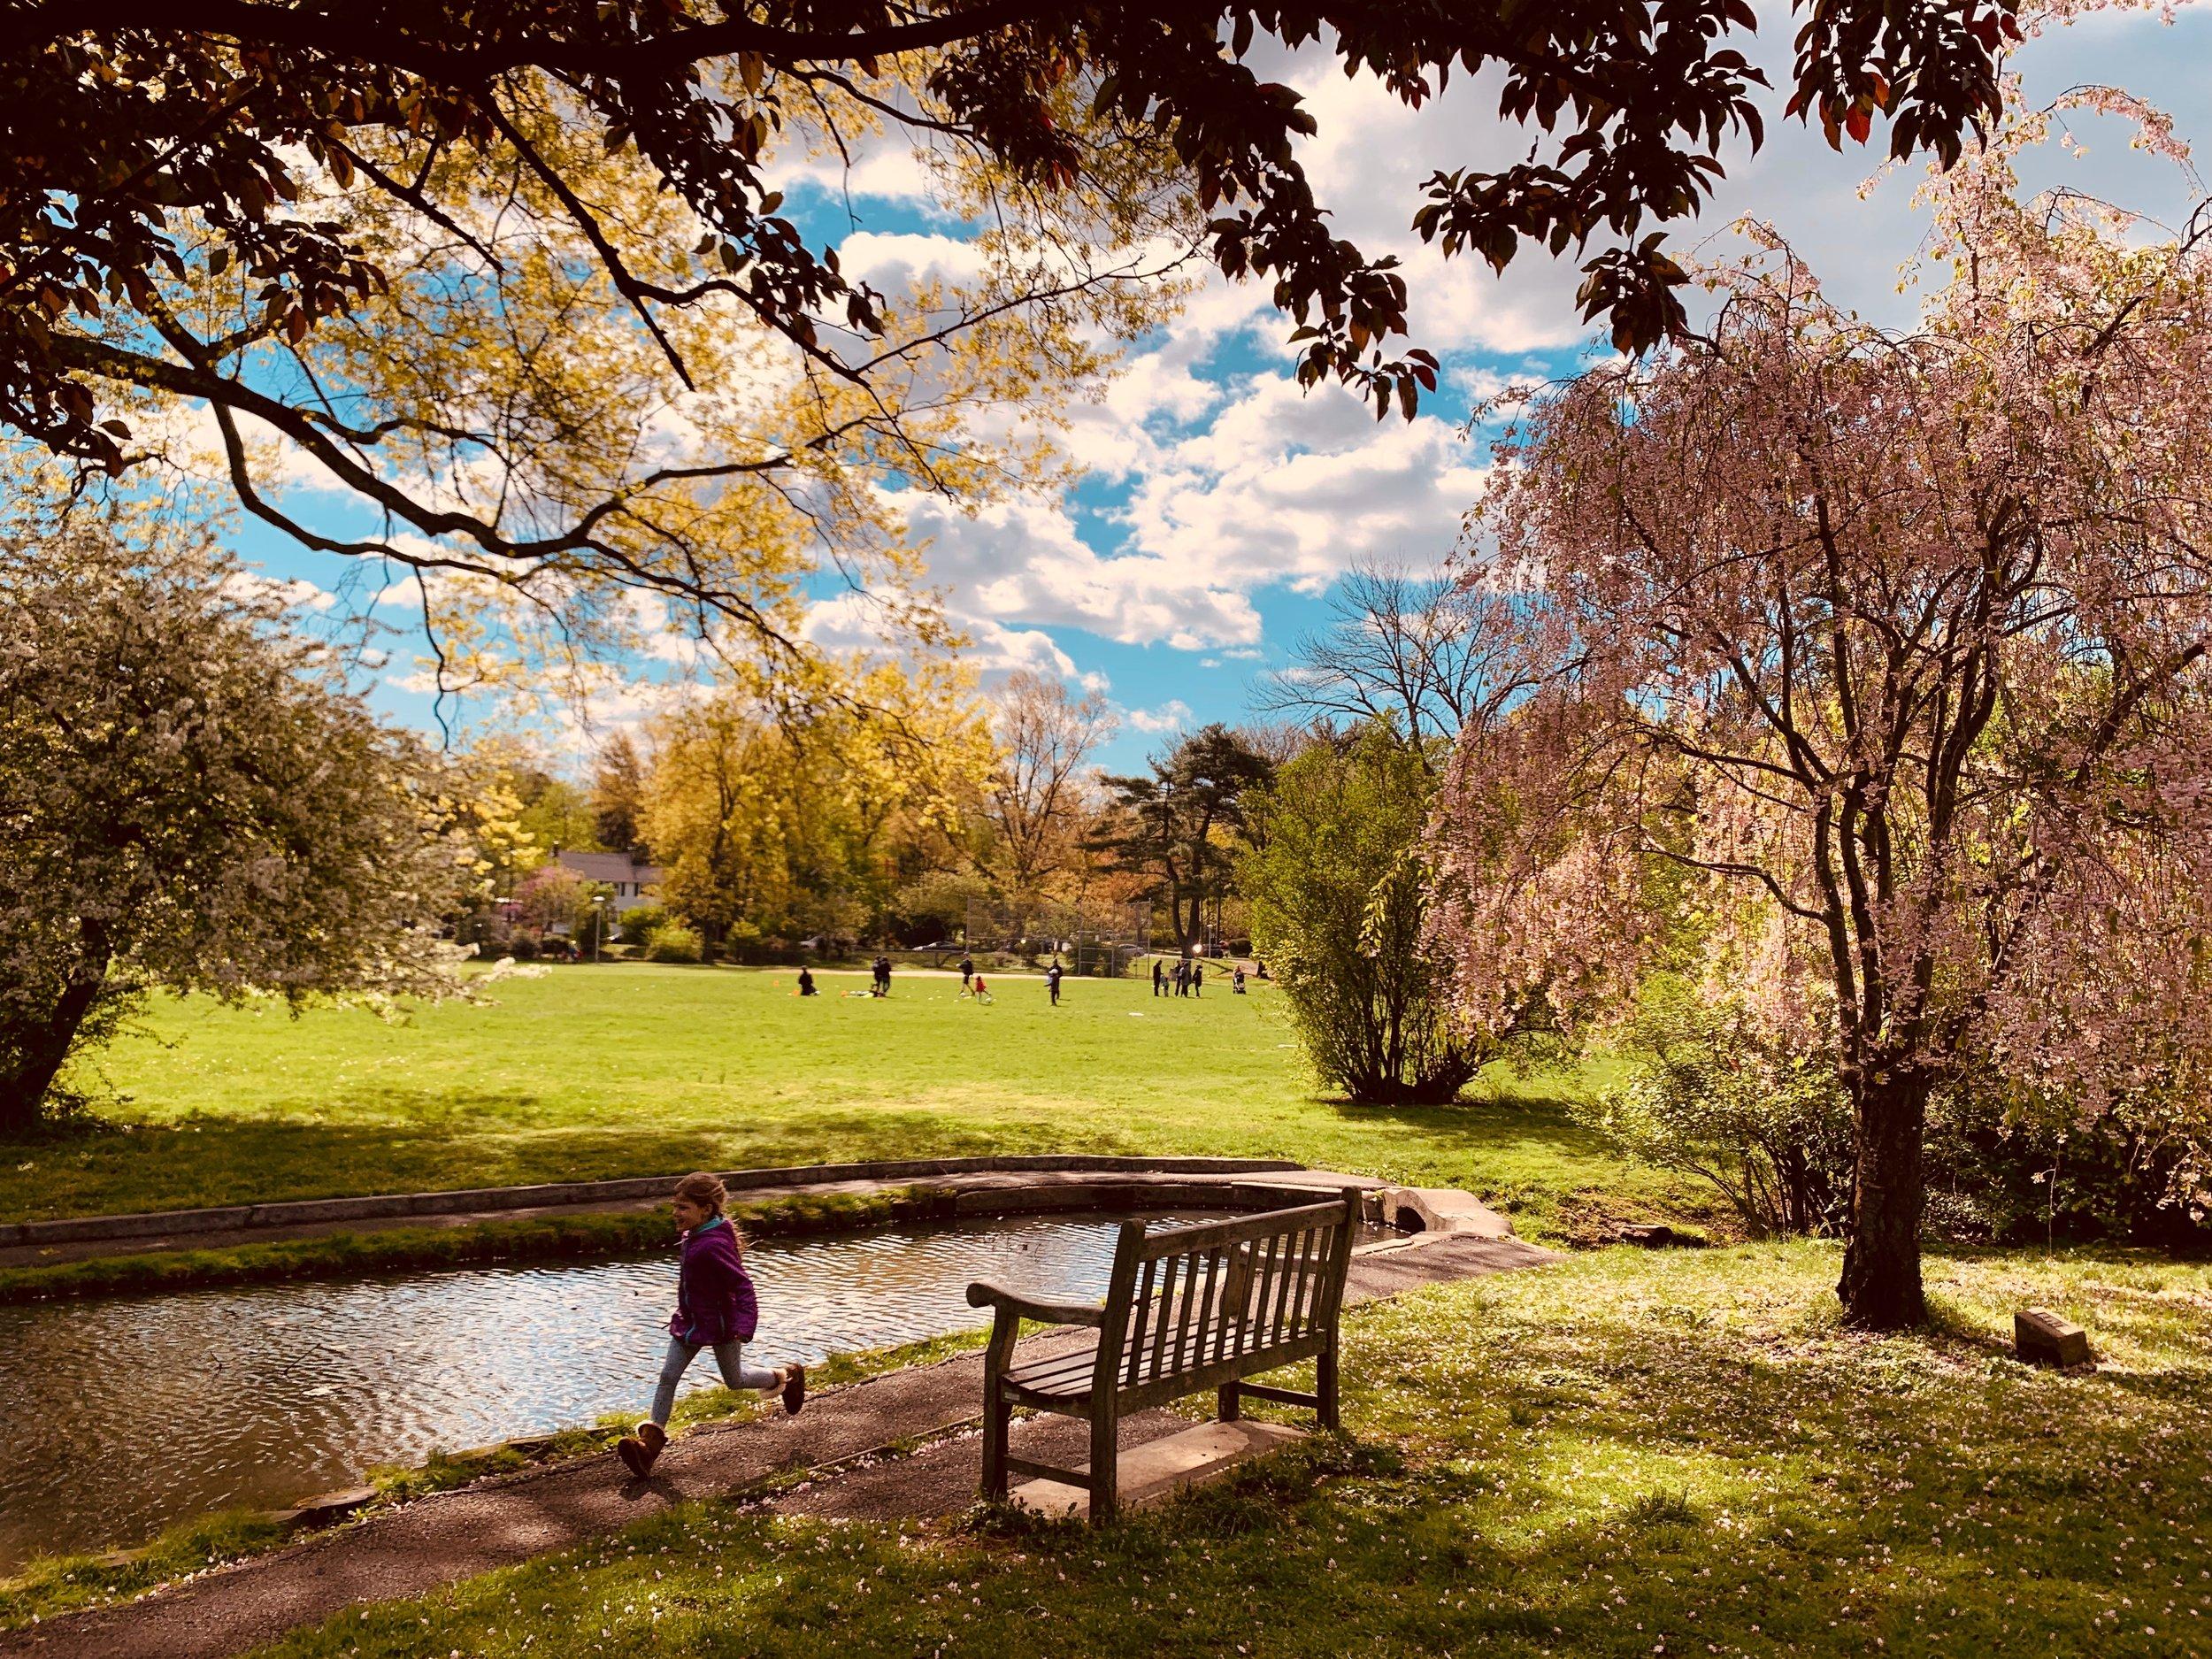 Memorial Park, Maplewood, NJ